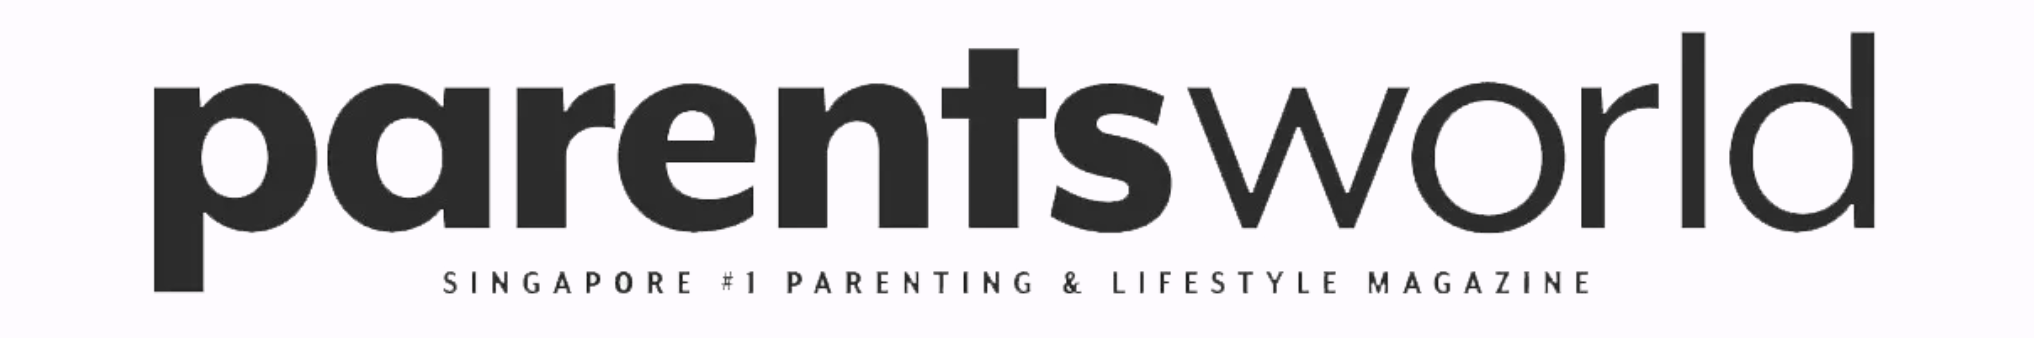 Parentsworld Singapore's #1 Parenting & Lifestyle magazine